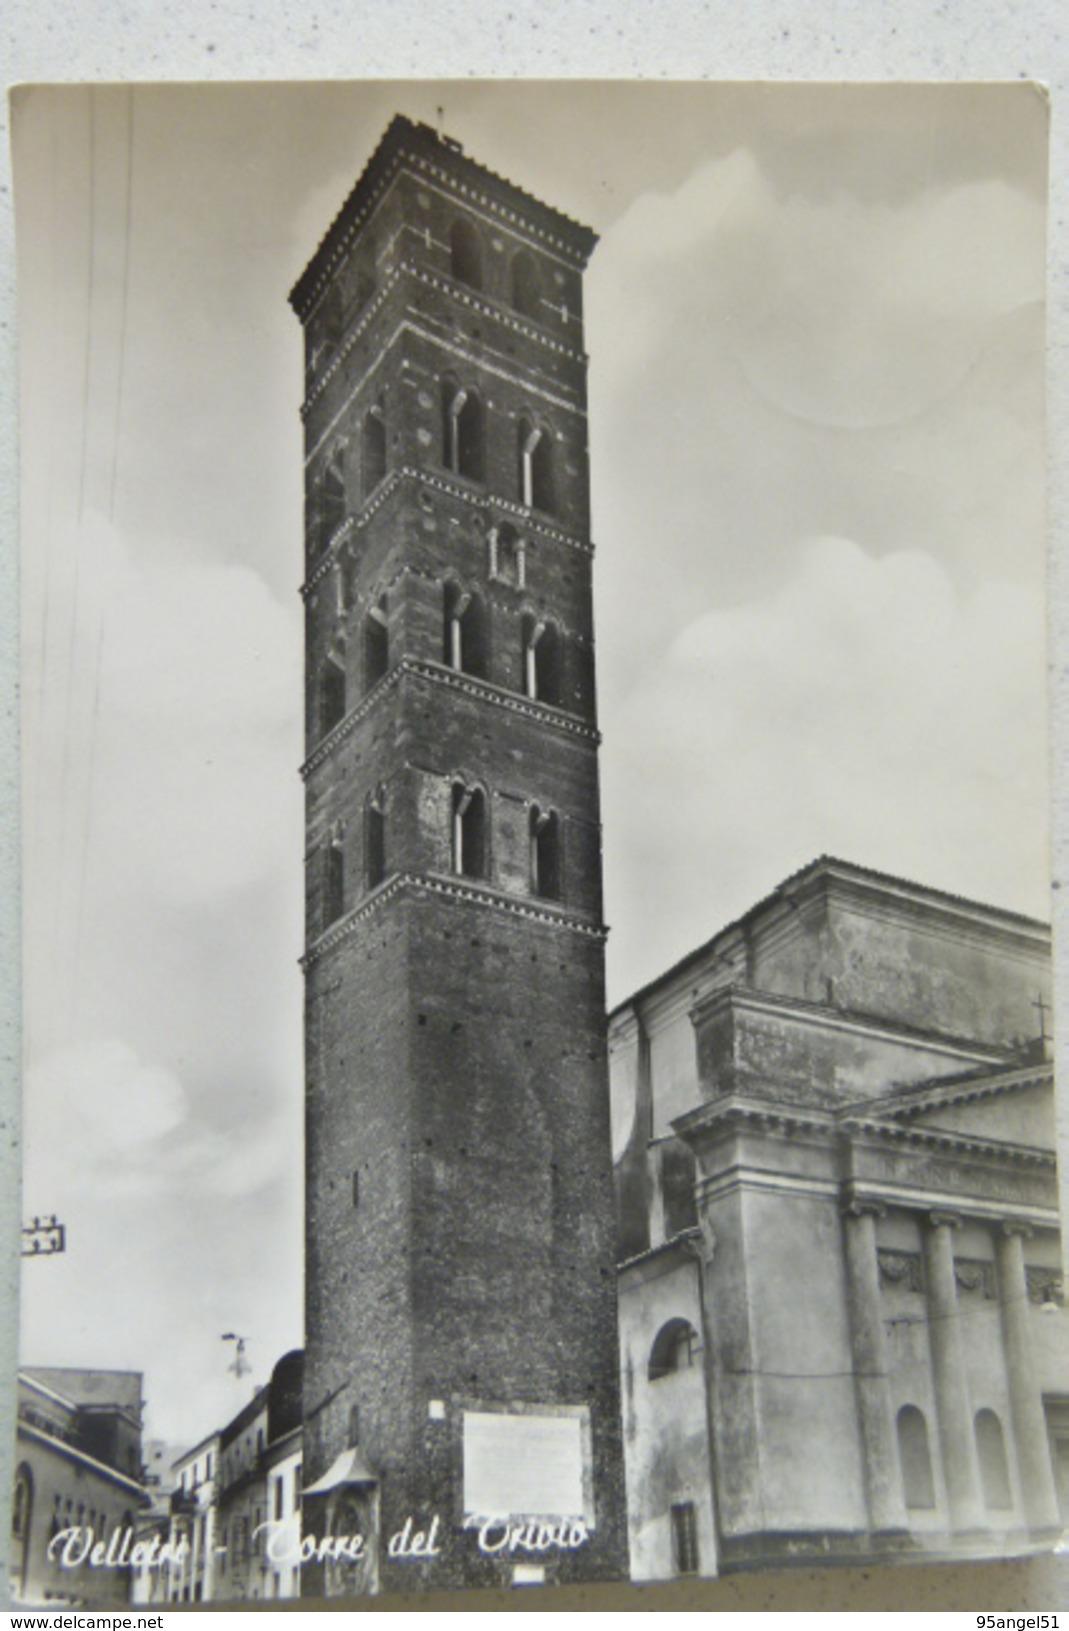 VELLETRI - TORRE DELTRIVIO - Velletri